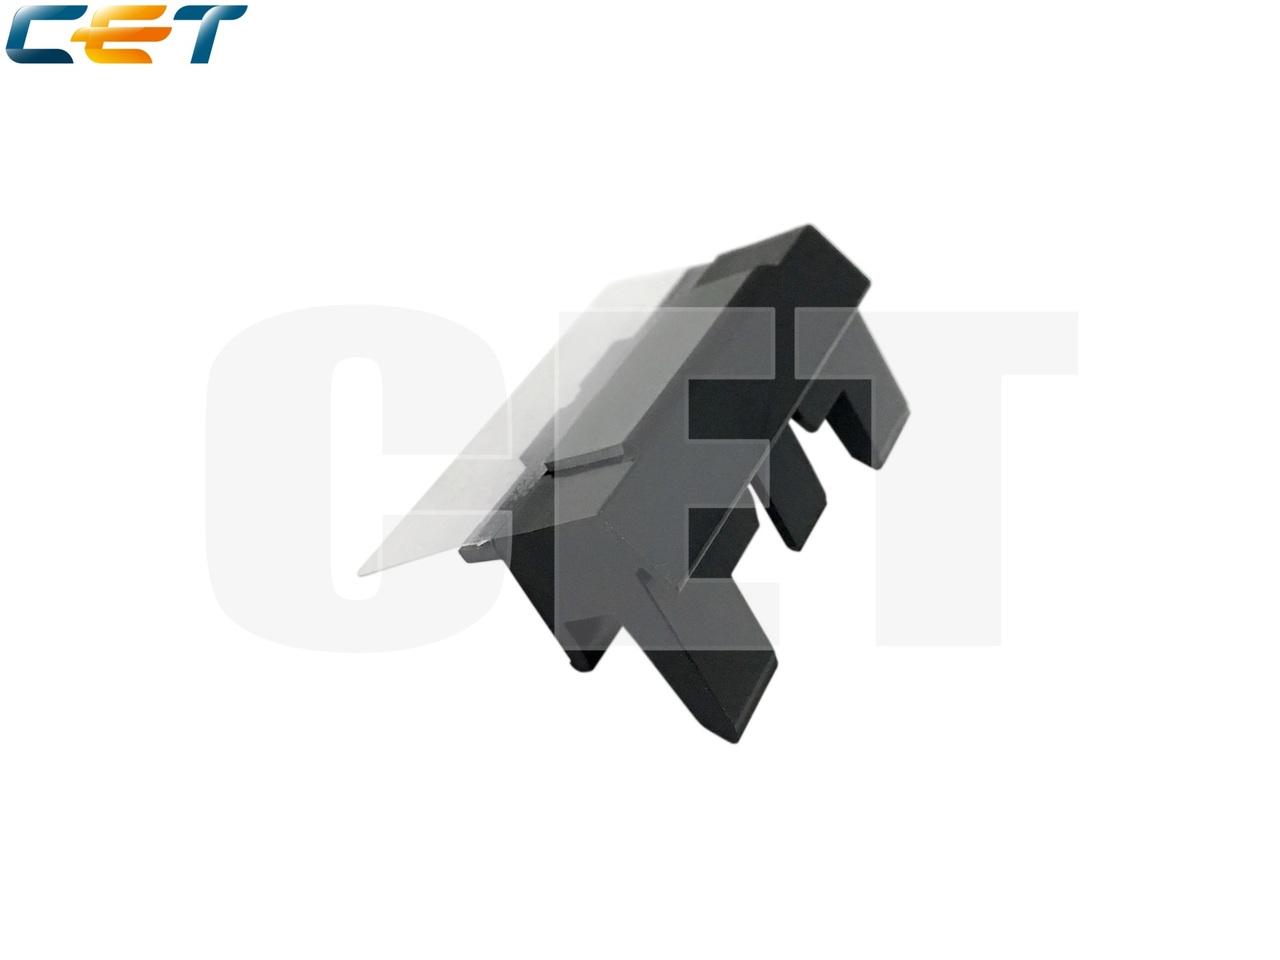 Тормозная площадка JC97-02669A для SAMSUNGML-2570/SCX-4650N (CET), DGP7511